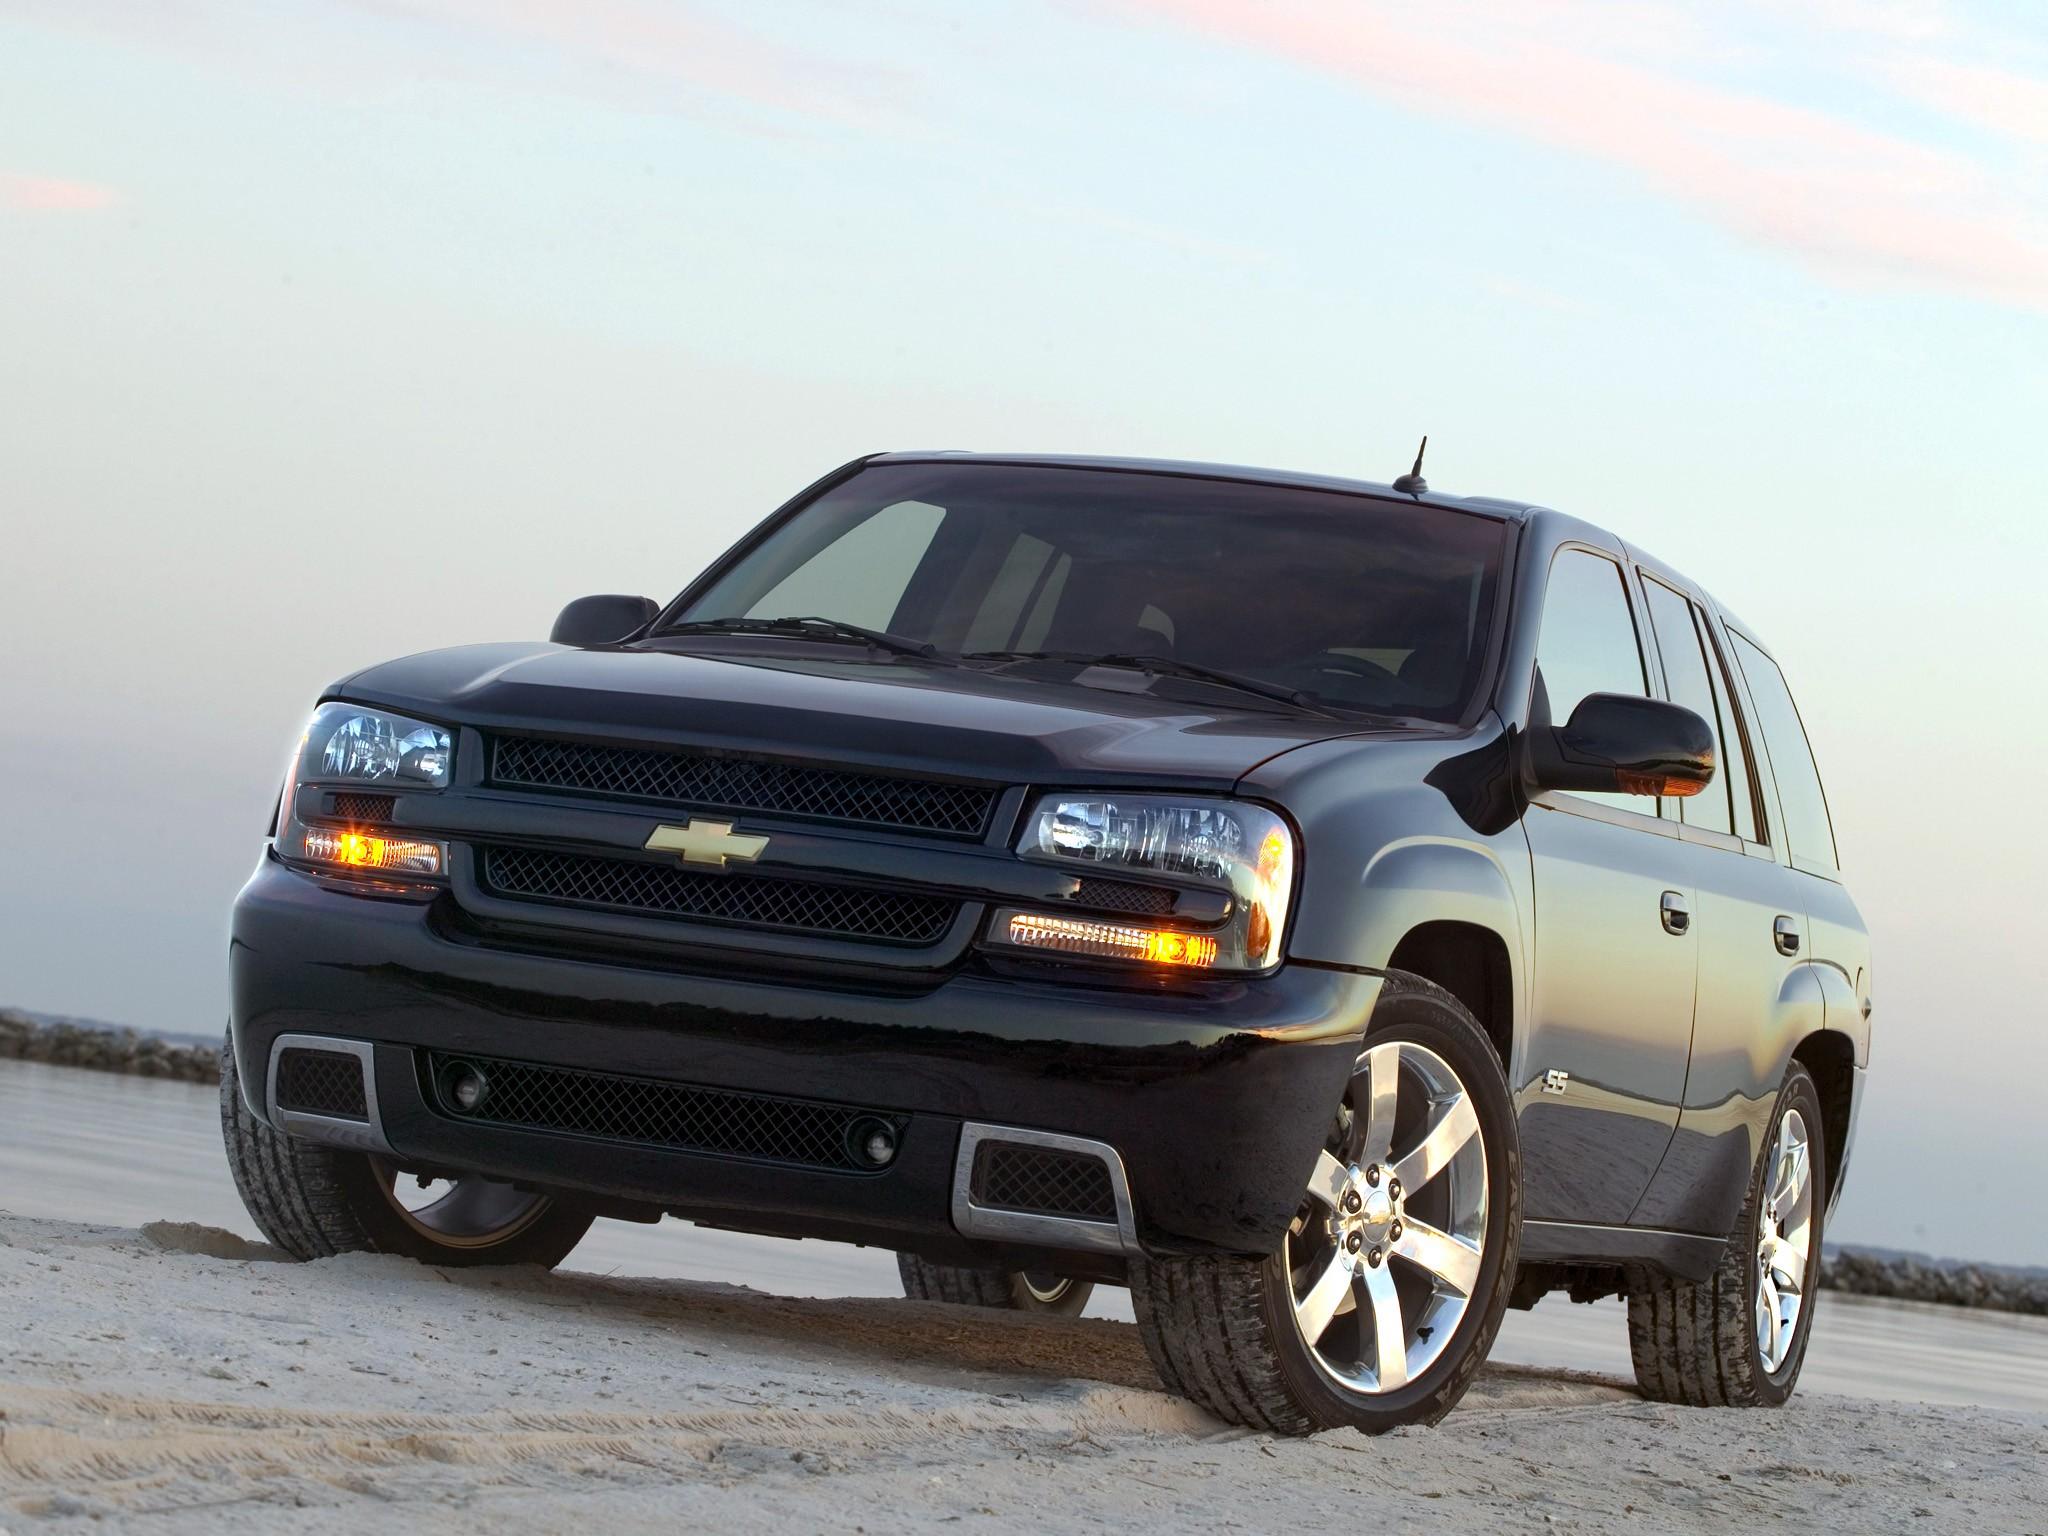 2007 Tahoe Reviews >> CHEVROLET TrailBlazer - 2008, 2009, 2010, 2011, 2012 - autoevolution